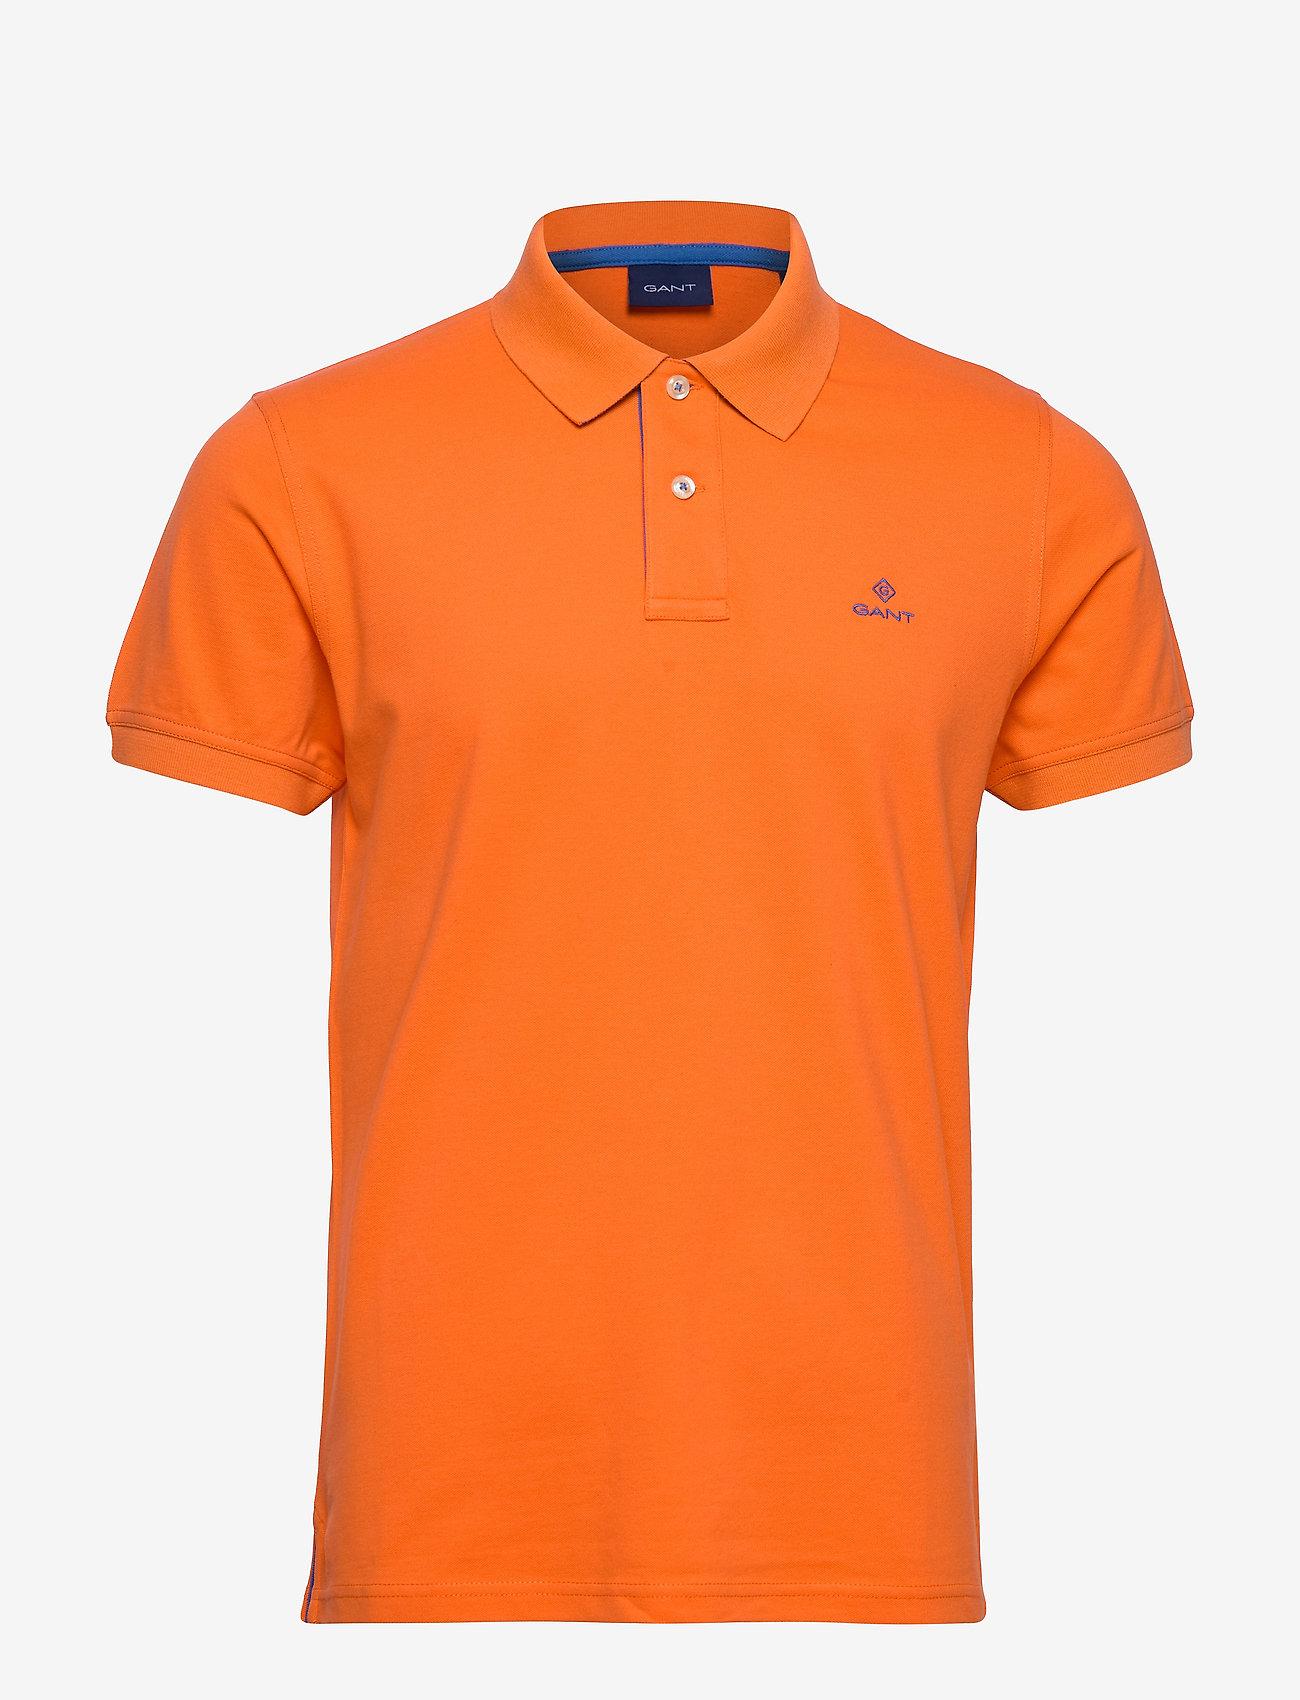 GANT - CONTRAST COLLAR PIQUE SS RUGGER - short-sleeved polos - sunny orange - 0